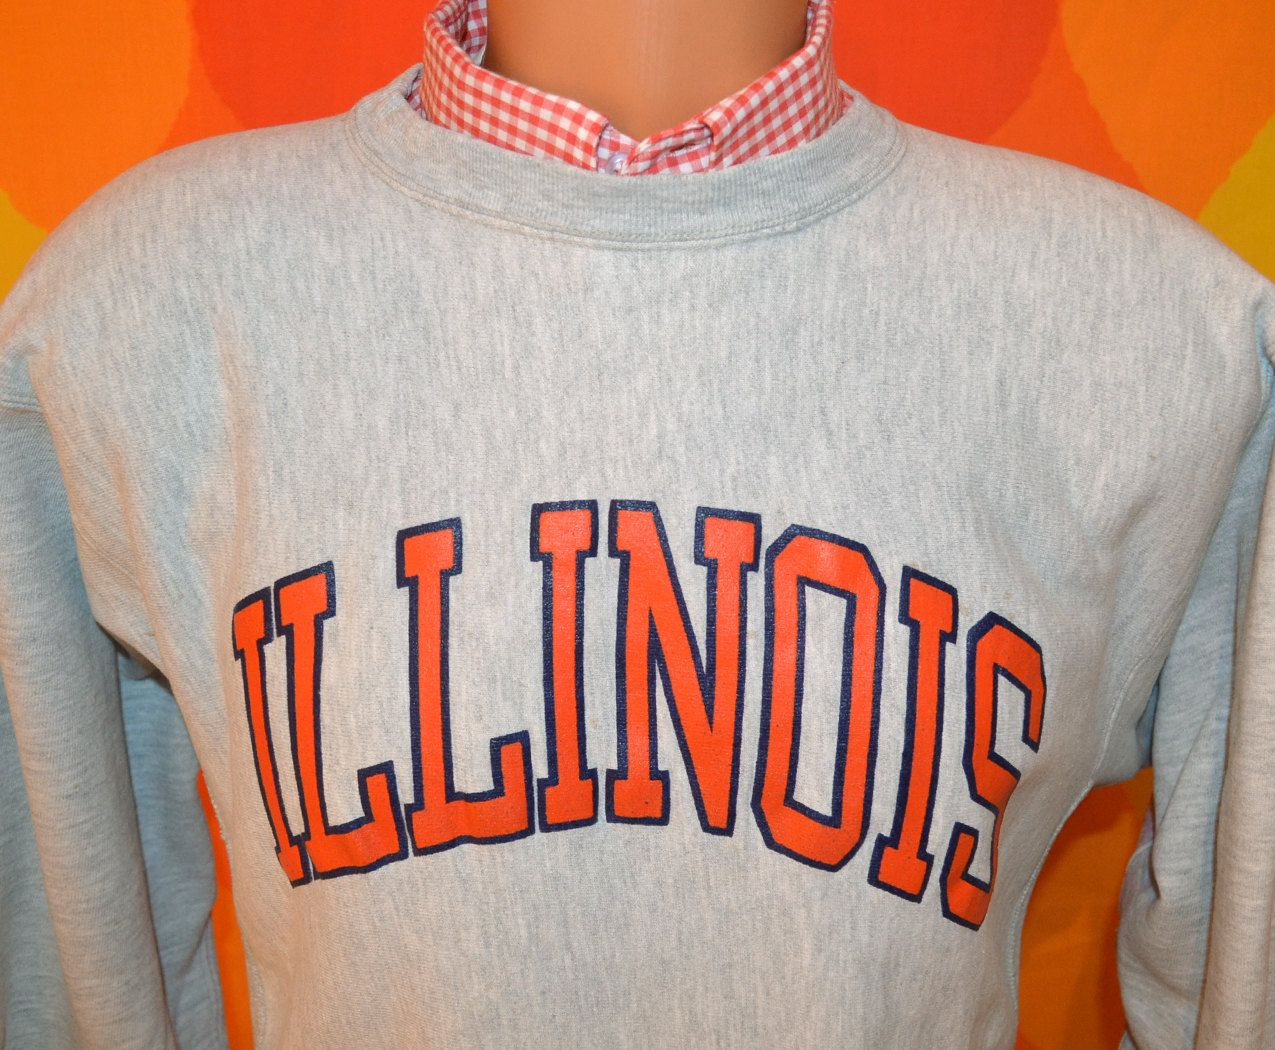 80s Vintage Sweatshirt University Of Illinois Illini Chief Etsy Sweatshirts Vintage Sweatshirt Vintage Crewneck Sweatshirt [ 1050 x 1275 Pixel ]